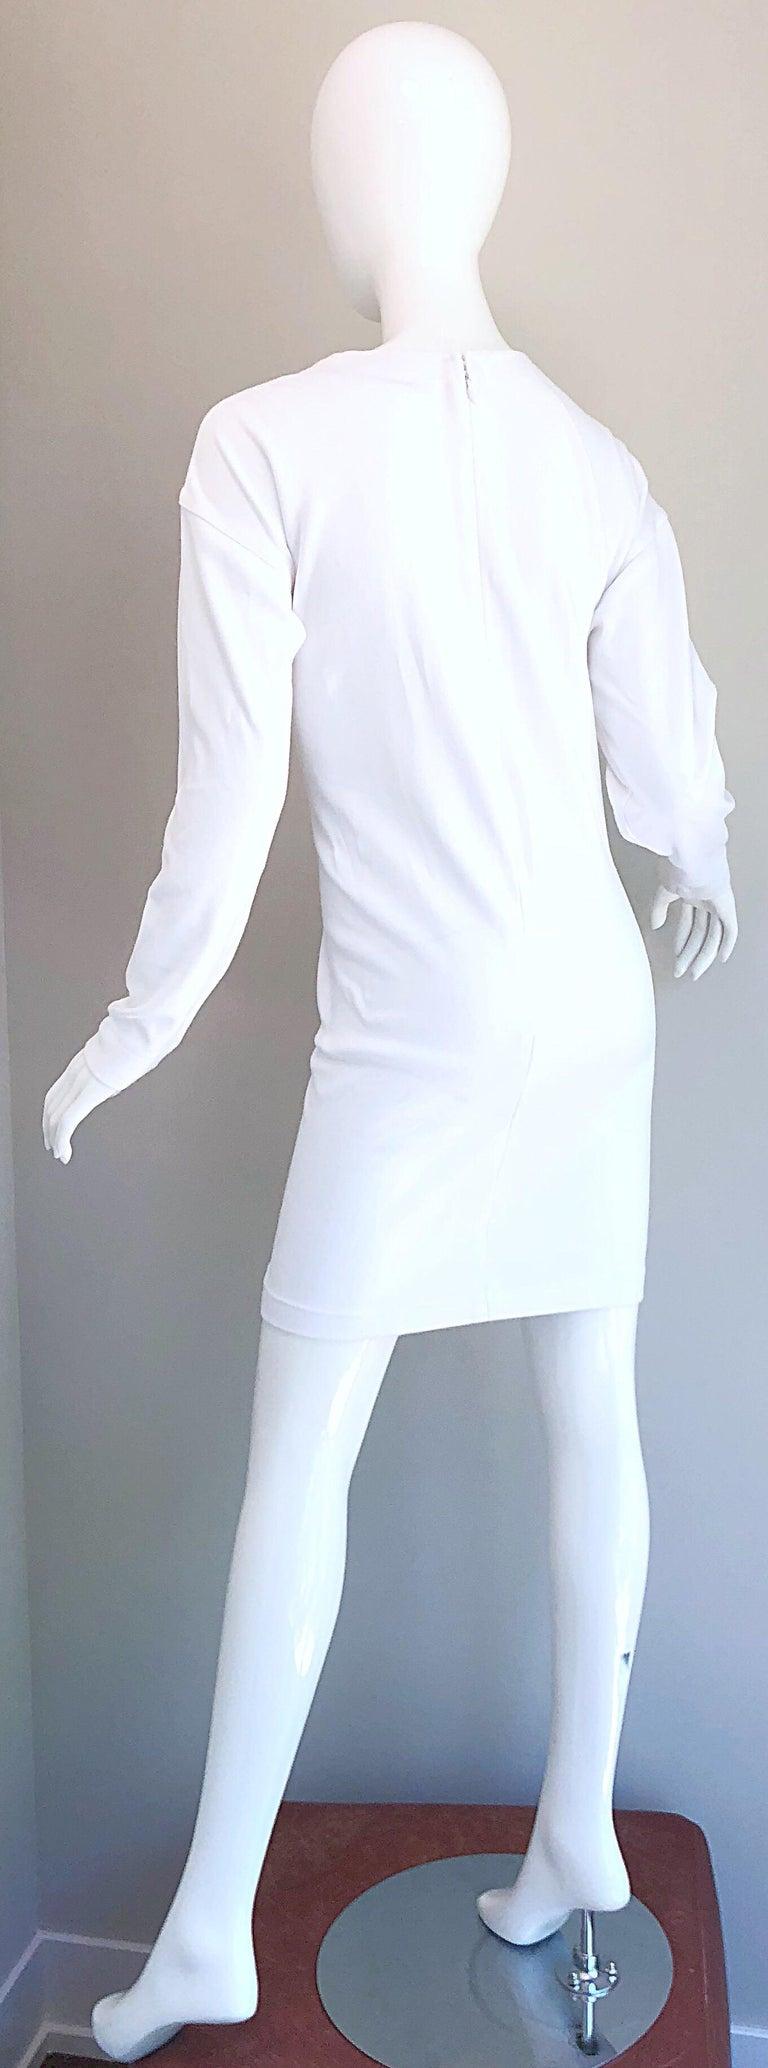 1990s Bill Blass Logo Mania White + Gold Vintage 90s Sweatshirt Dress Medium For Sale 3